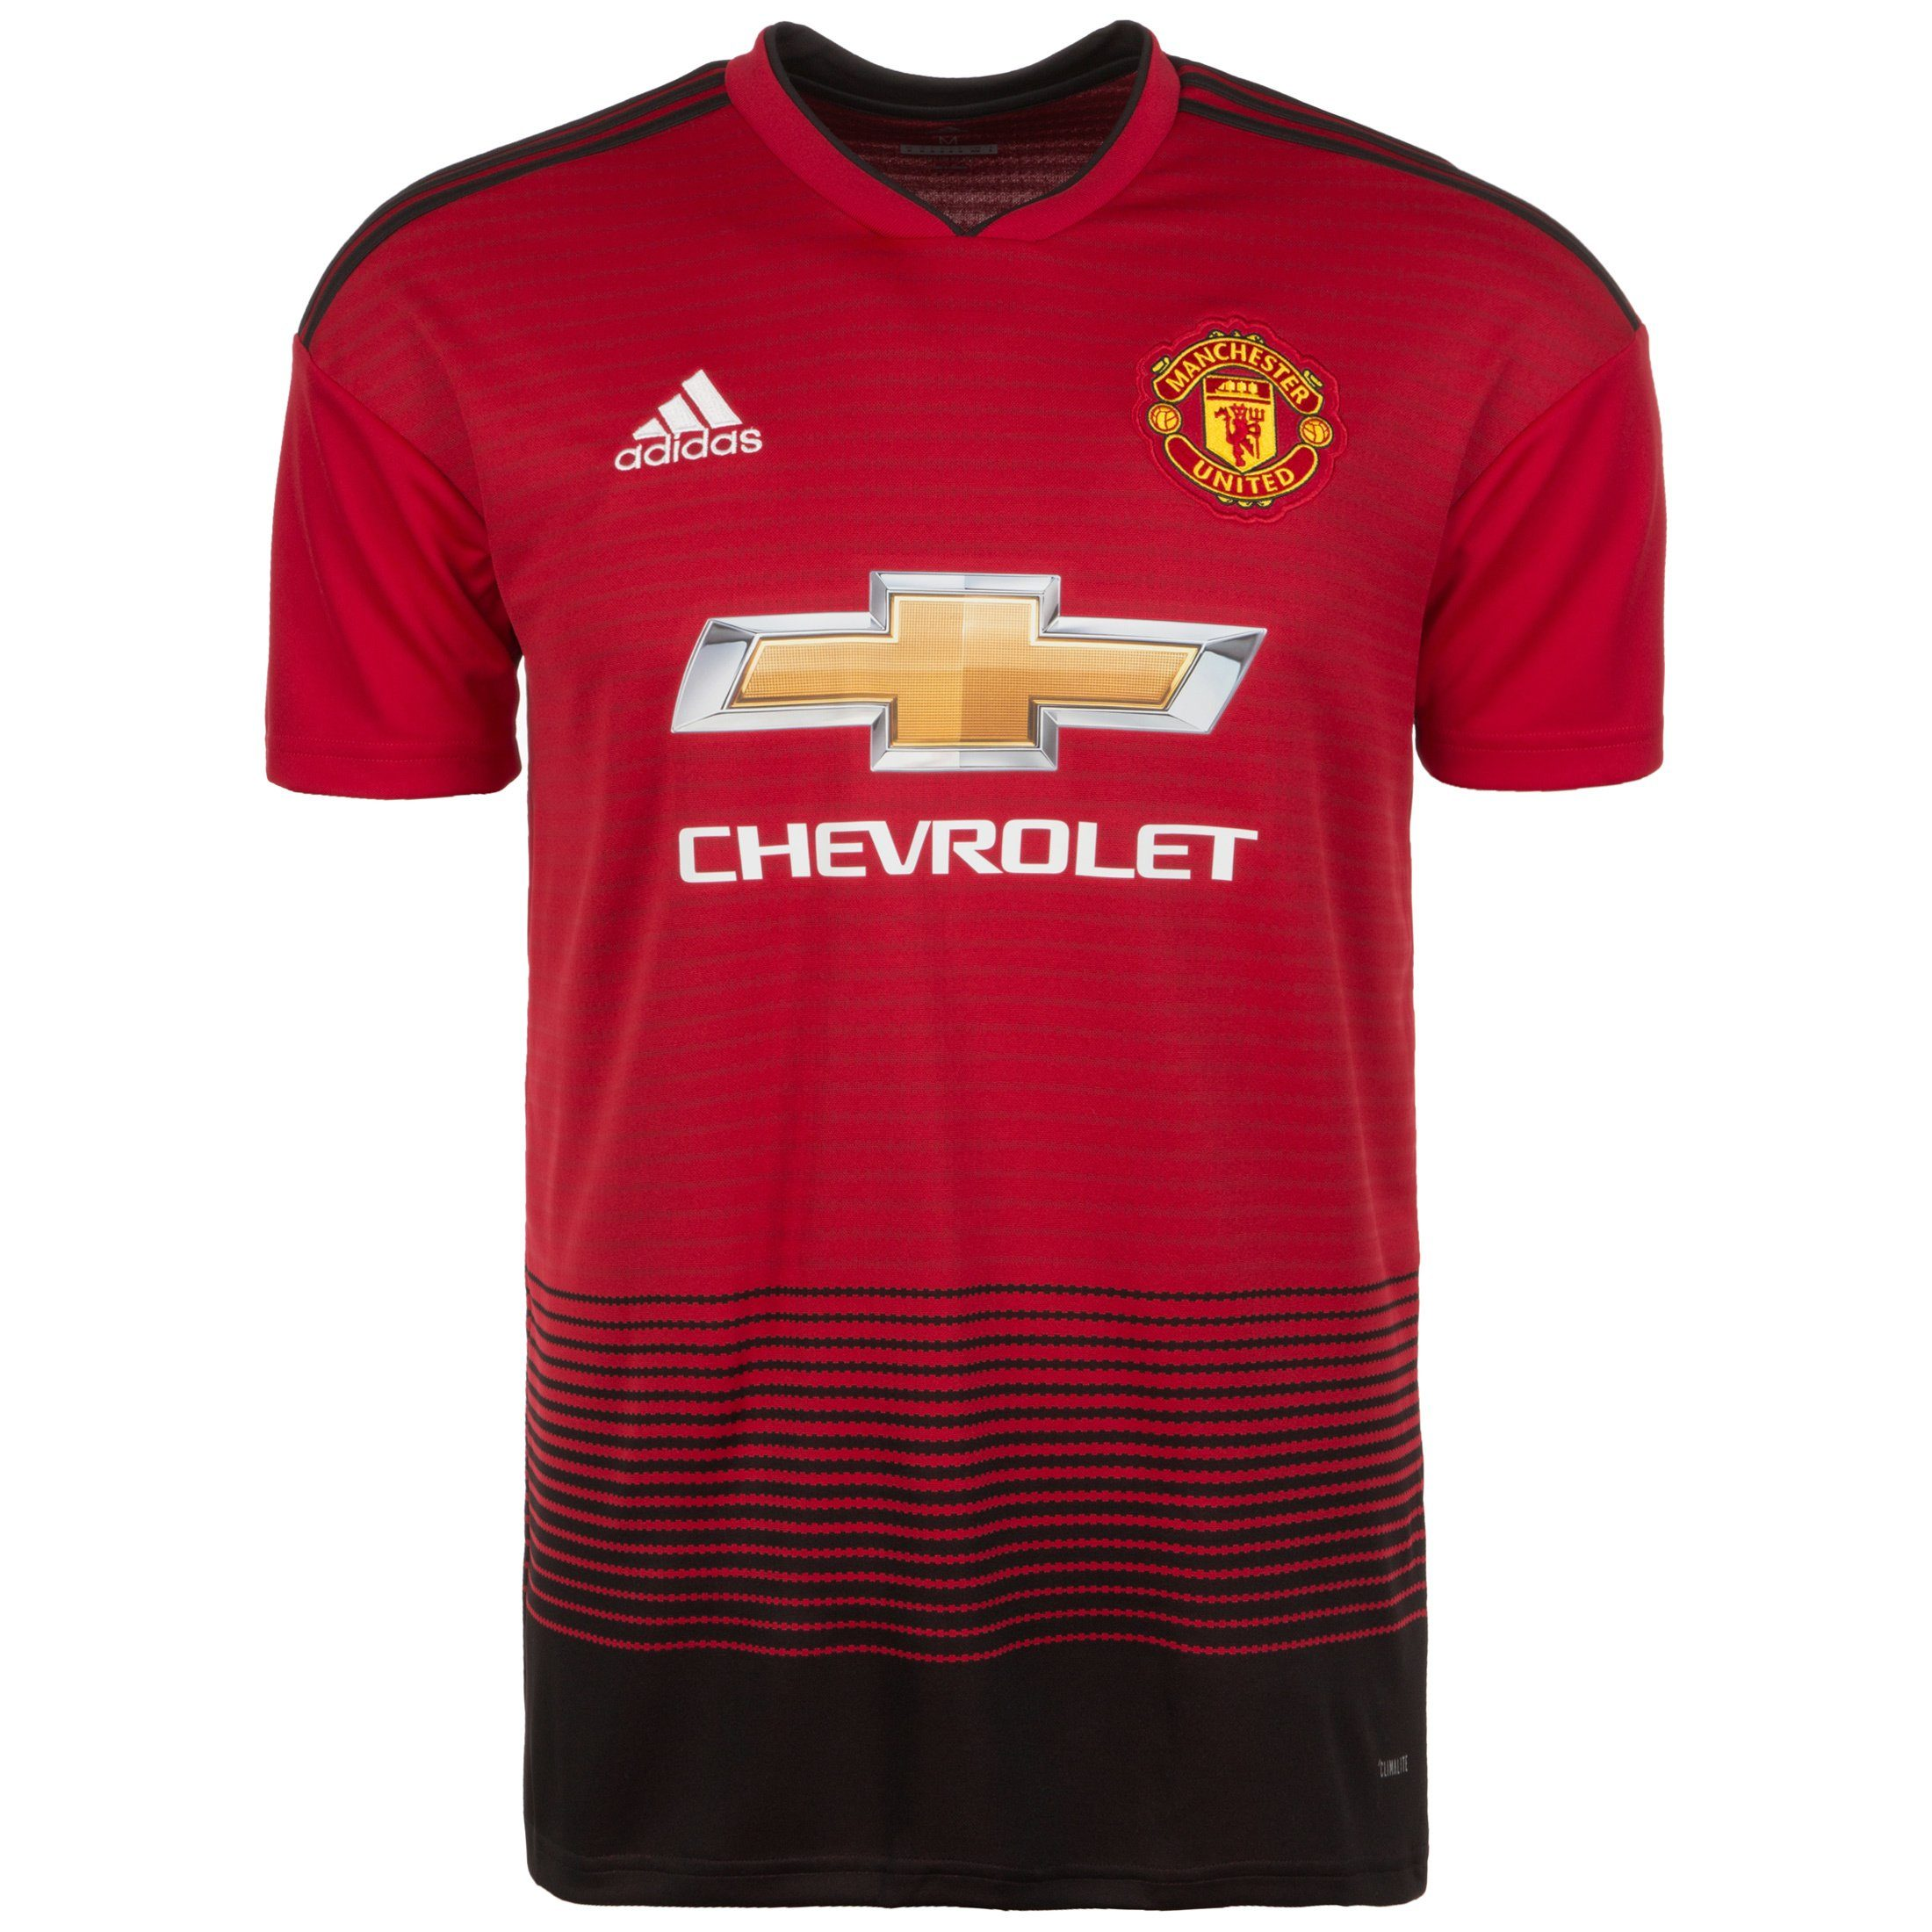 adidas Performance Fußballtrikot Manchester United 18/19 Heim | Sportbekleidung > Trikots > Fußballtrikots | Rot | Trikot - Ab | Adidas Performance